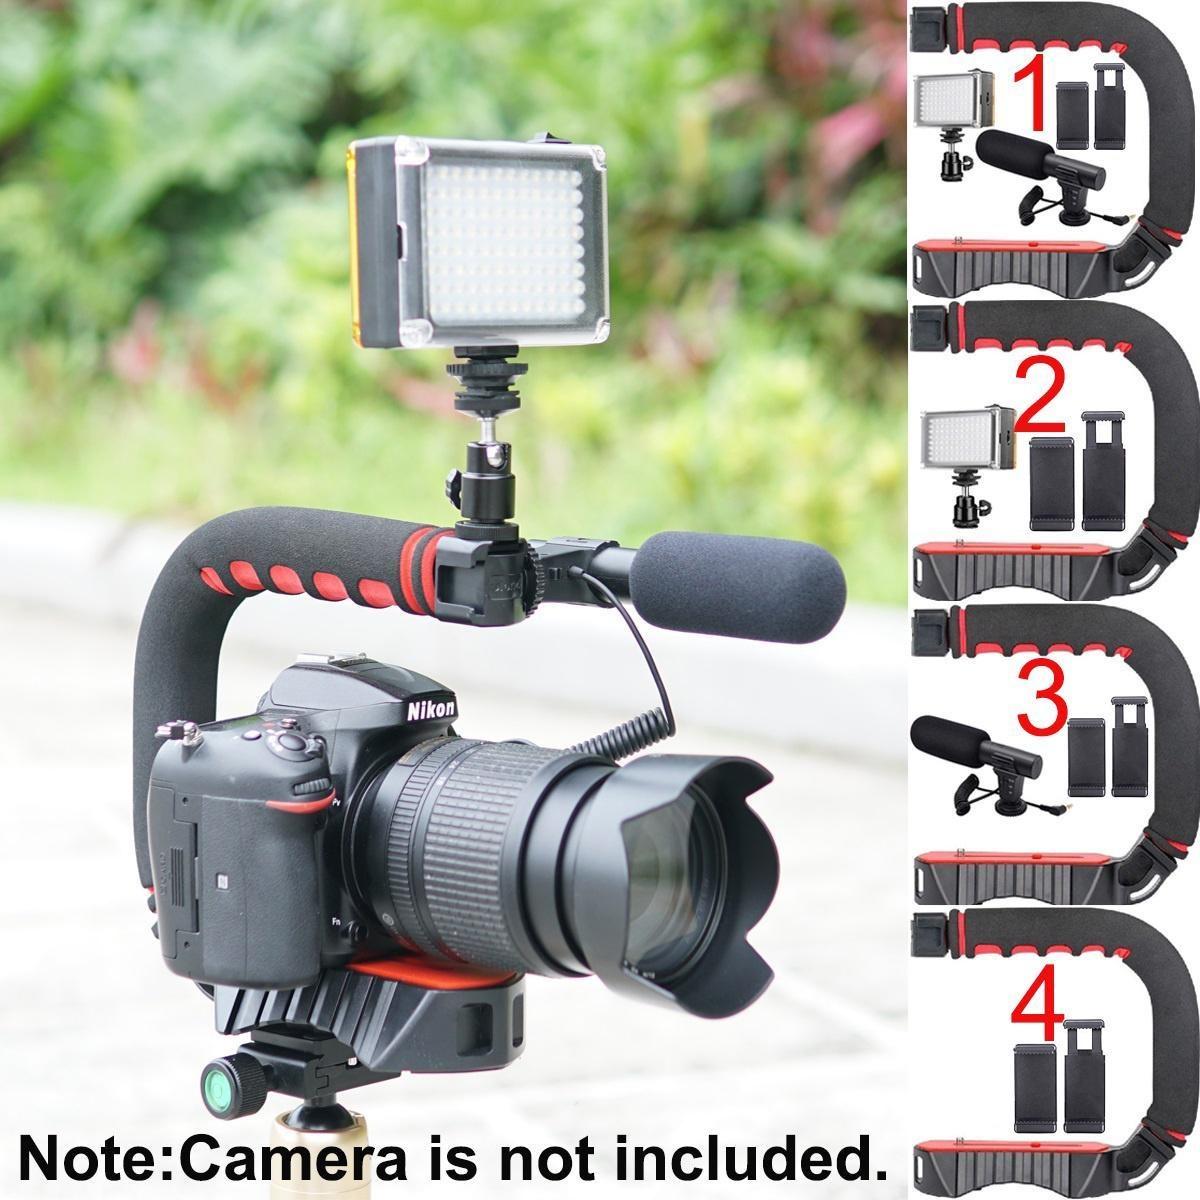 Nikon Coolpix S9300 Vertical Shoe Mount Stabilizer Handle Pro Video Stabilizing Handle Grip for